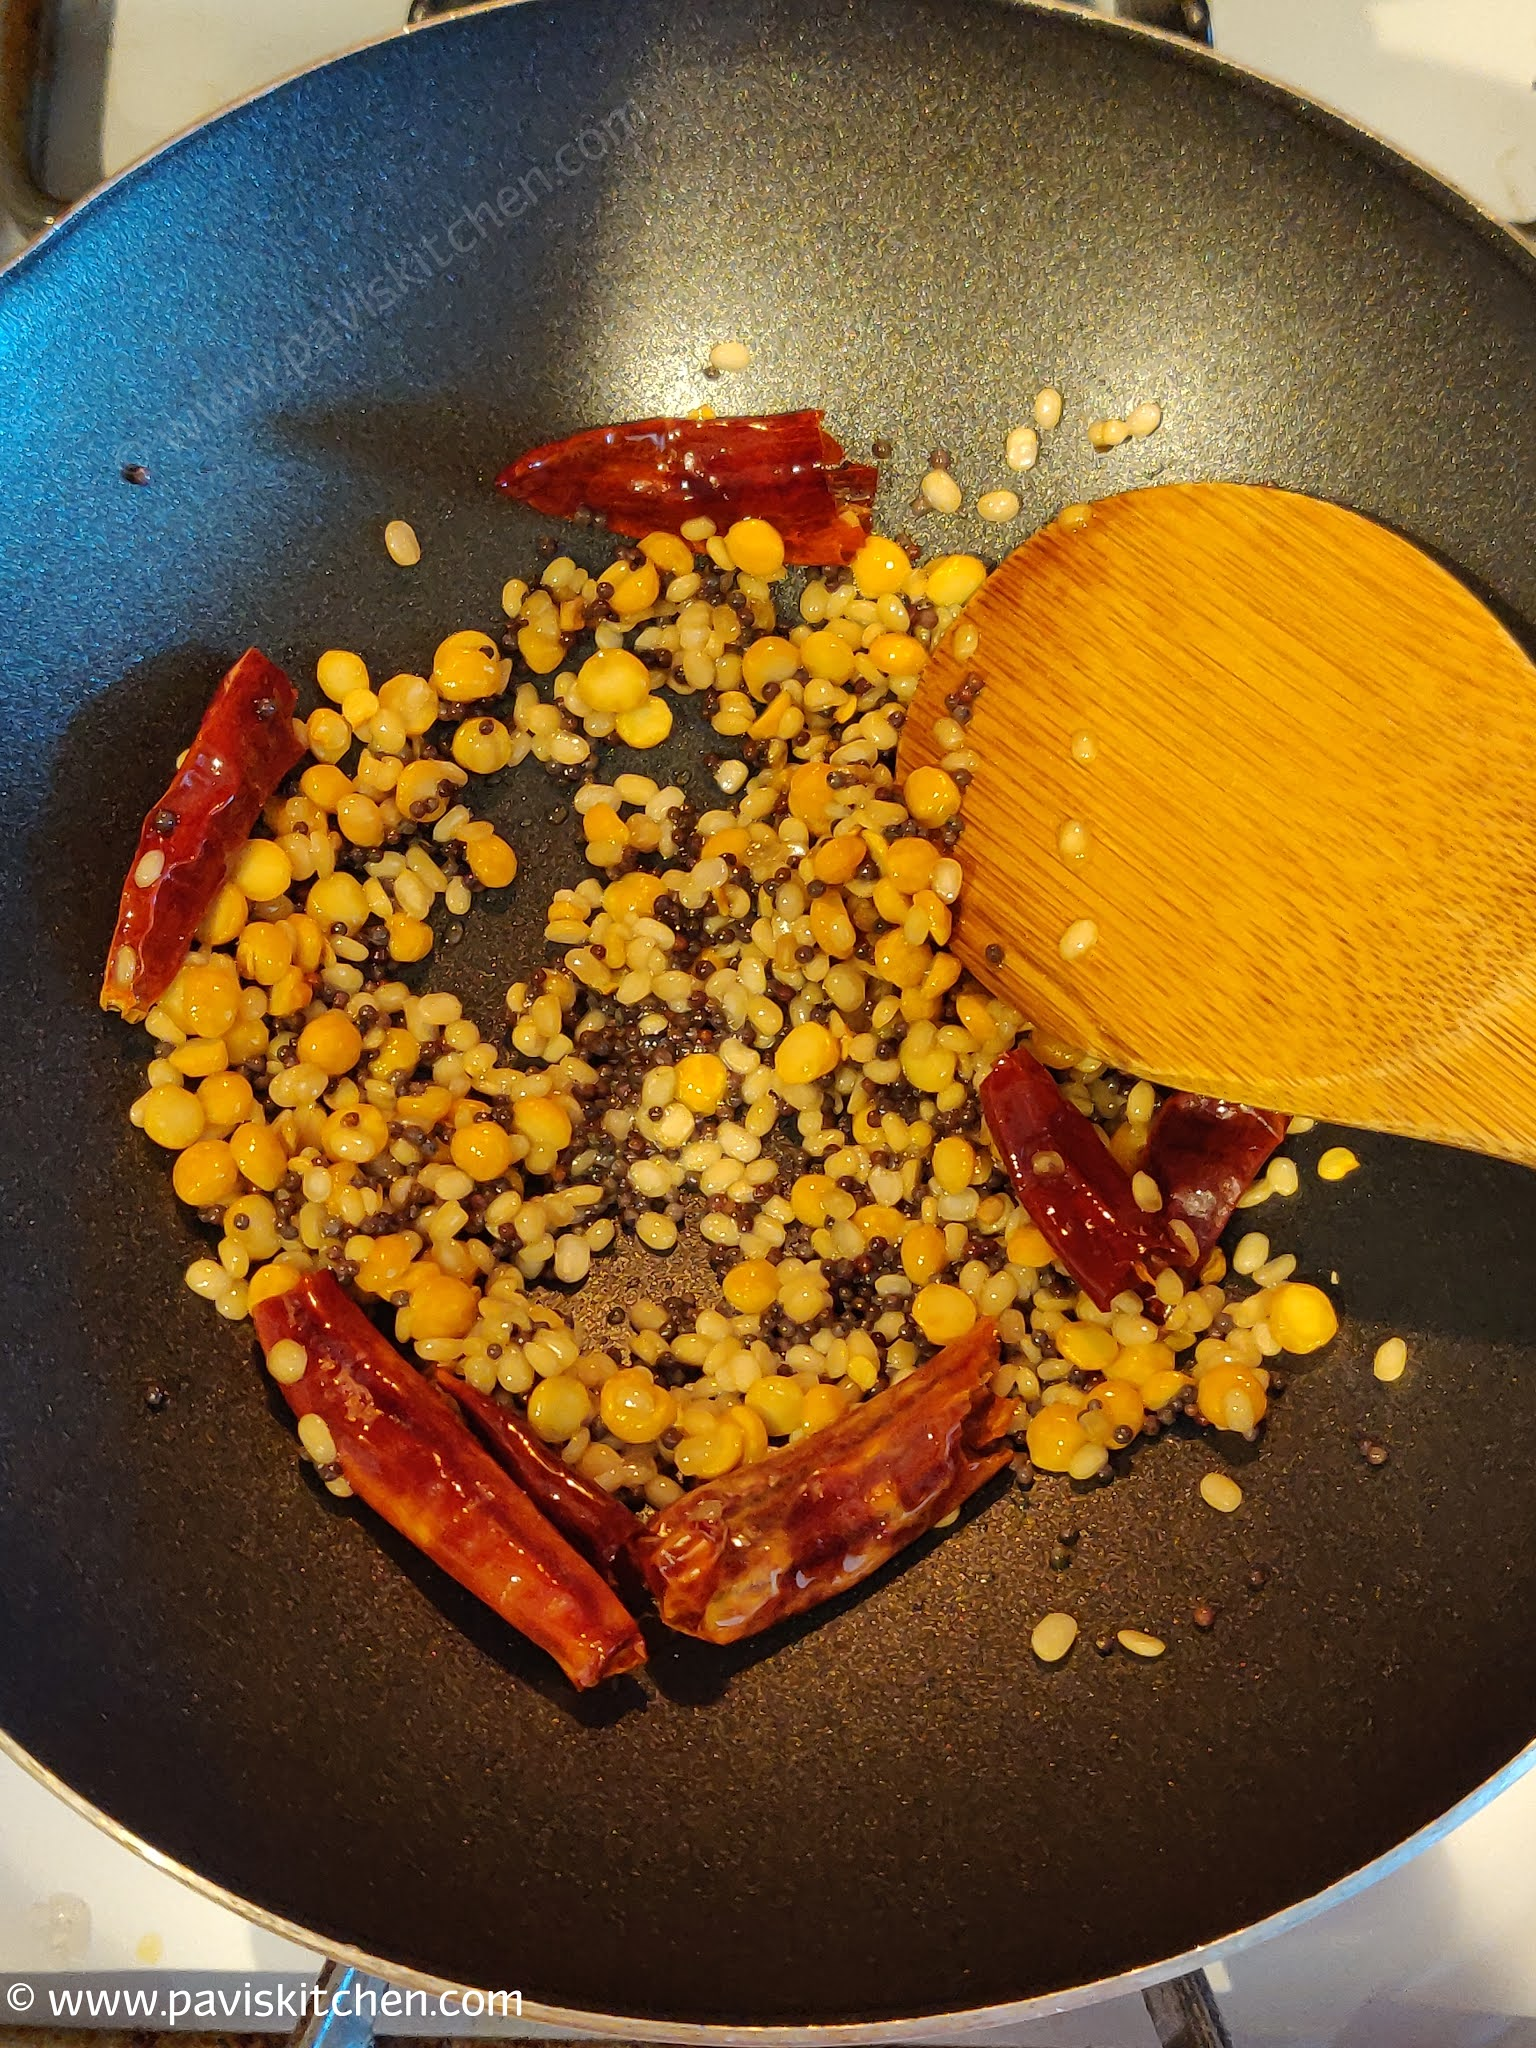 Pineapple gojju recipe | pineapple sasive | Ananas menaskai sasive